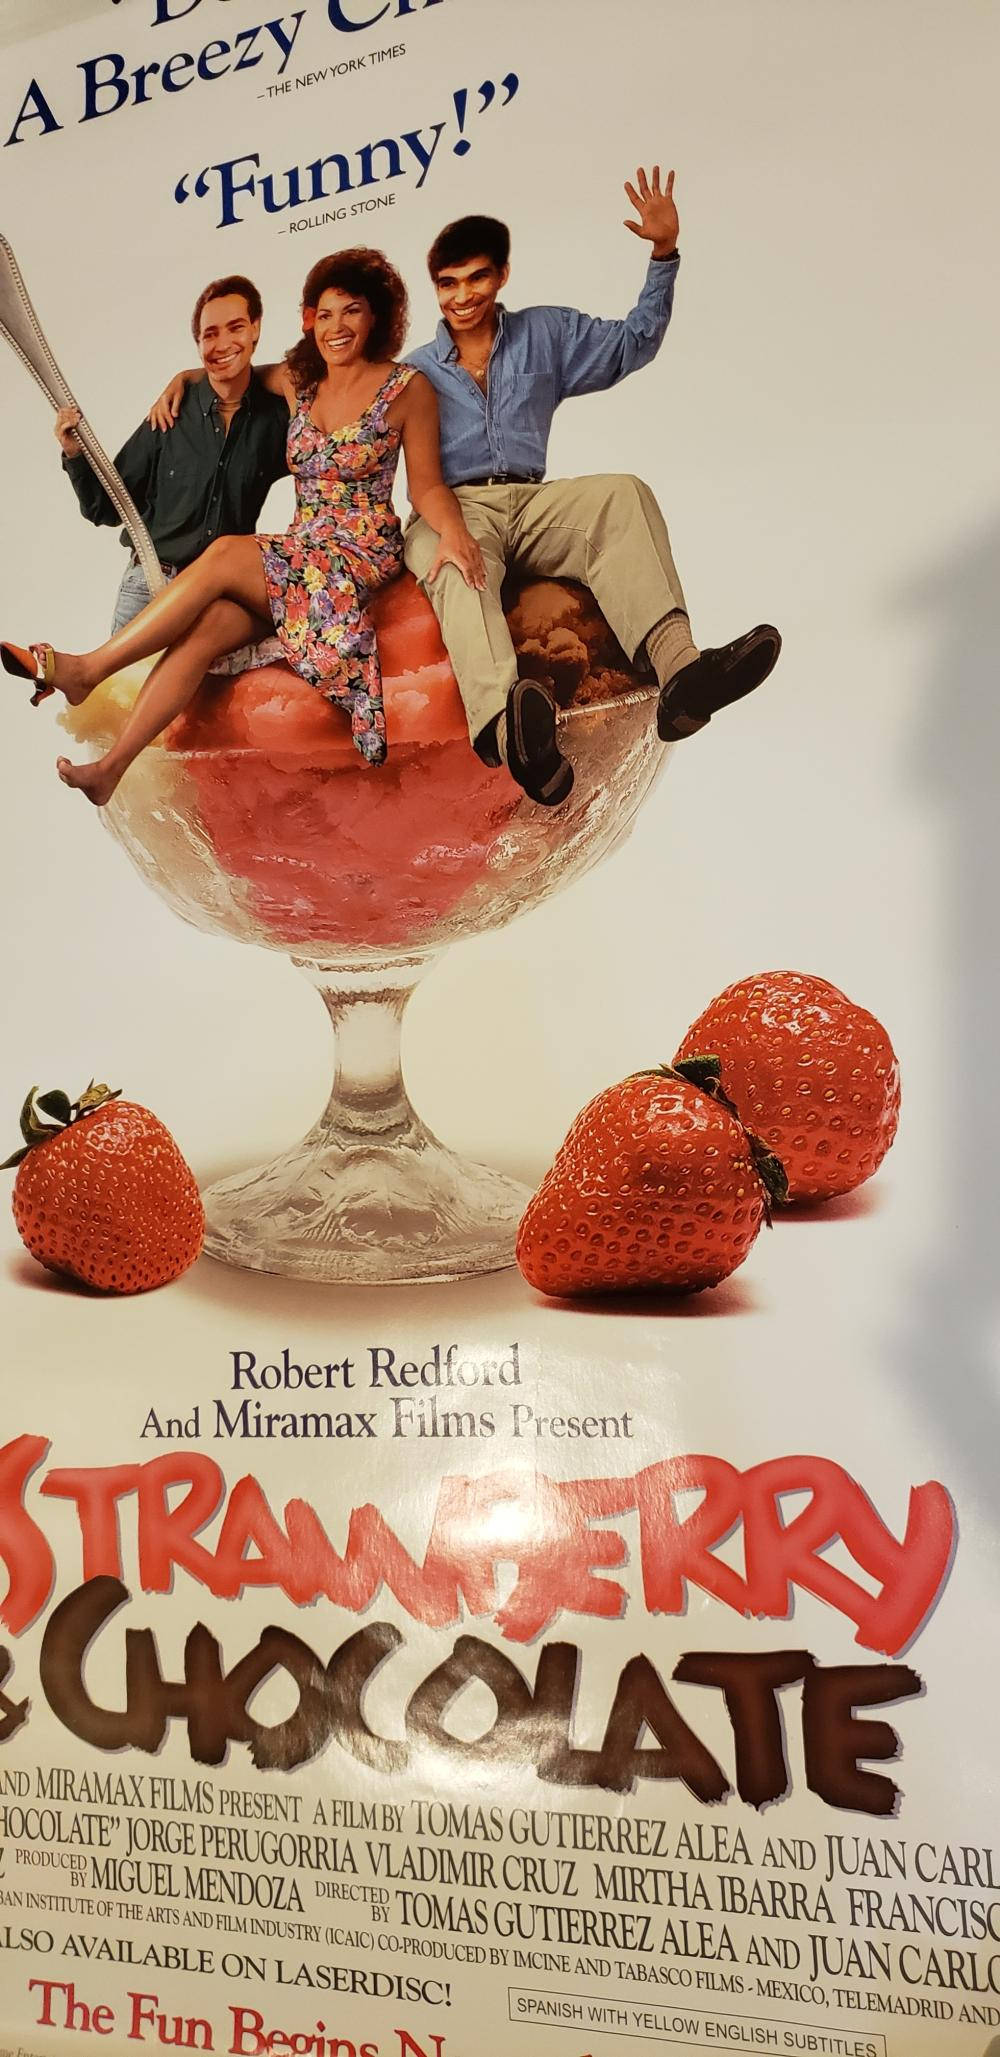 STRAWBERRY AND CHOCOLATE movie poster ROBERT REDFORD